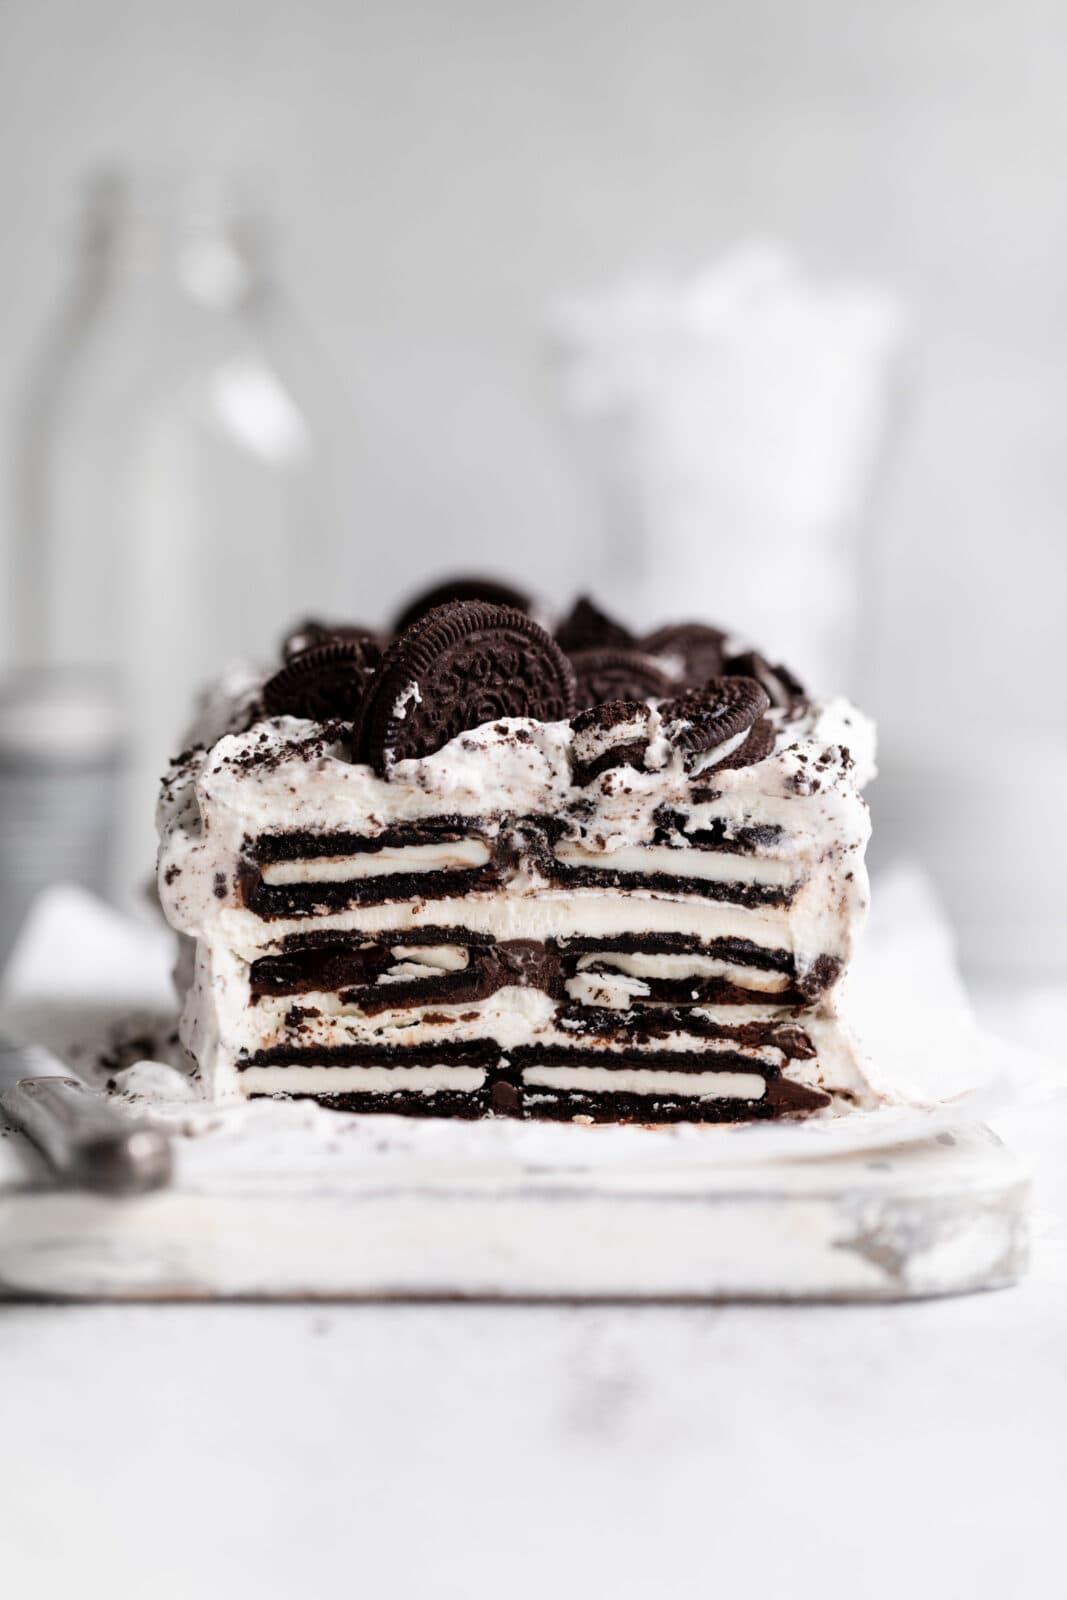 mocha cookies and cream icebox cake